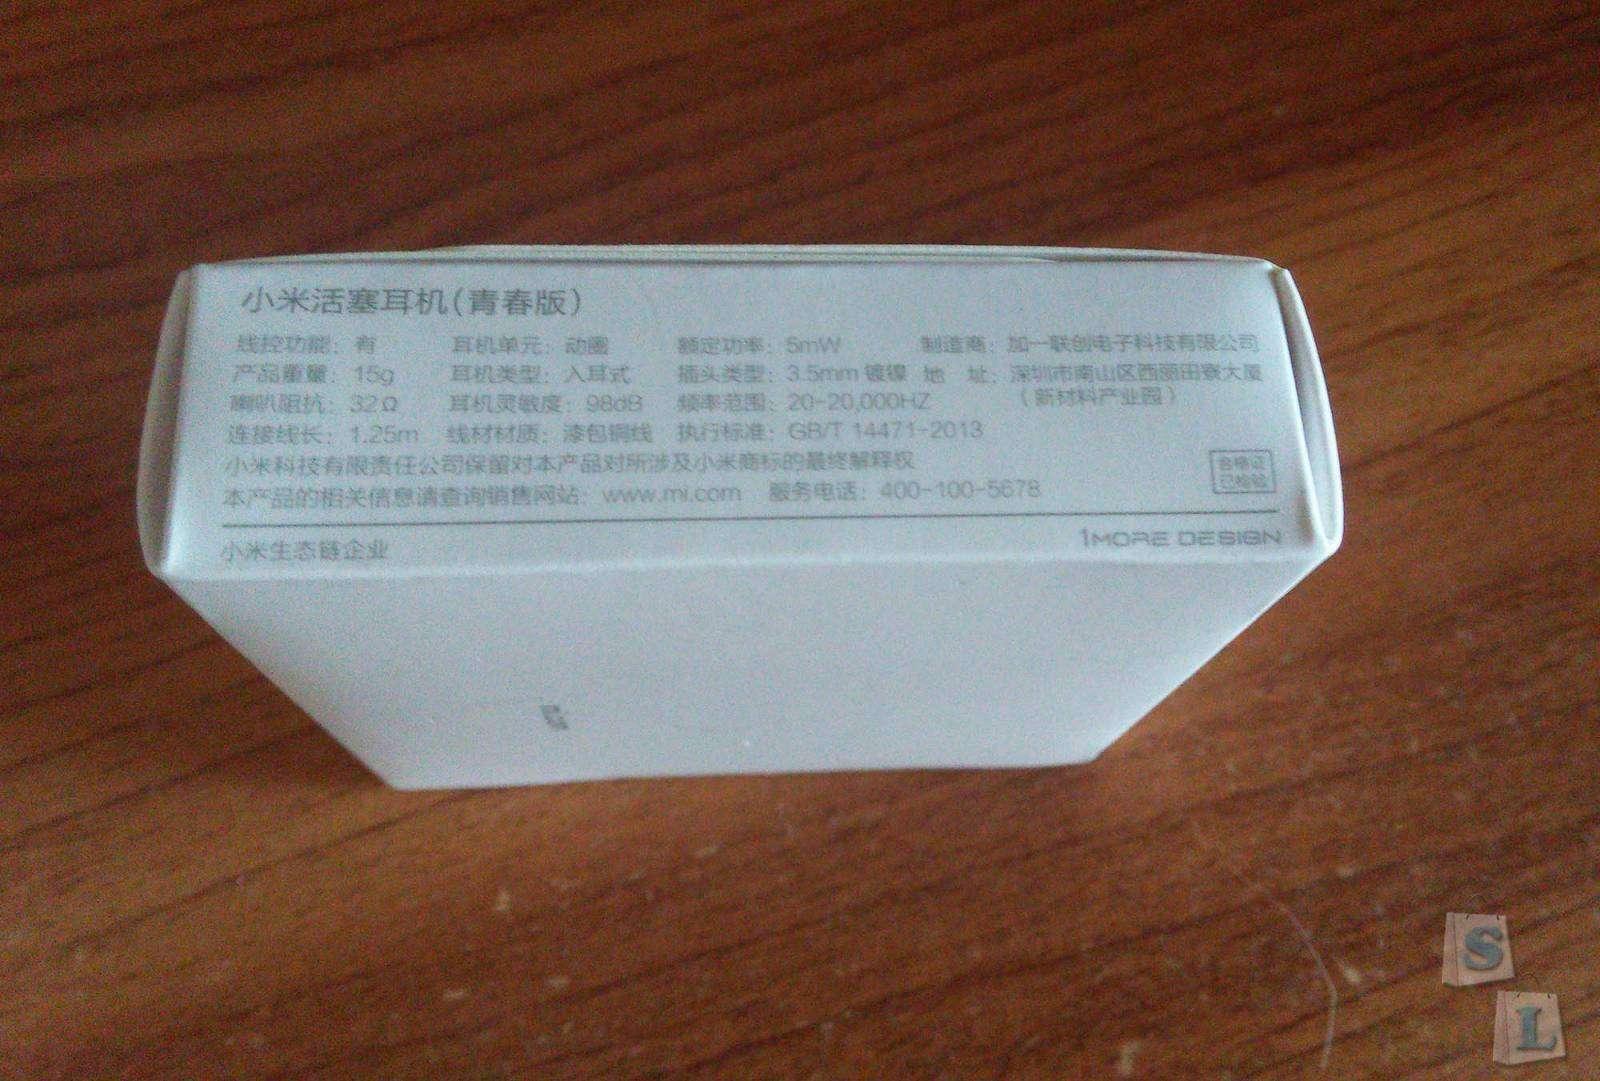 Aliexpress: Xiaomi Piston 3 Youth Edition